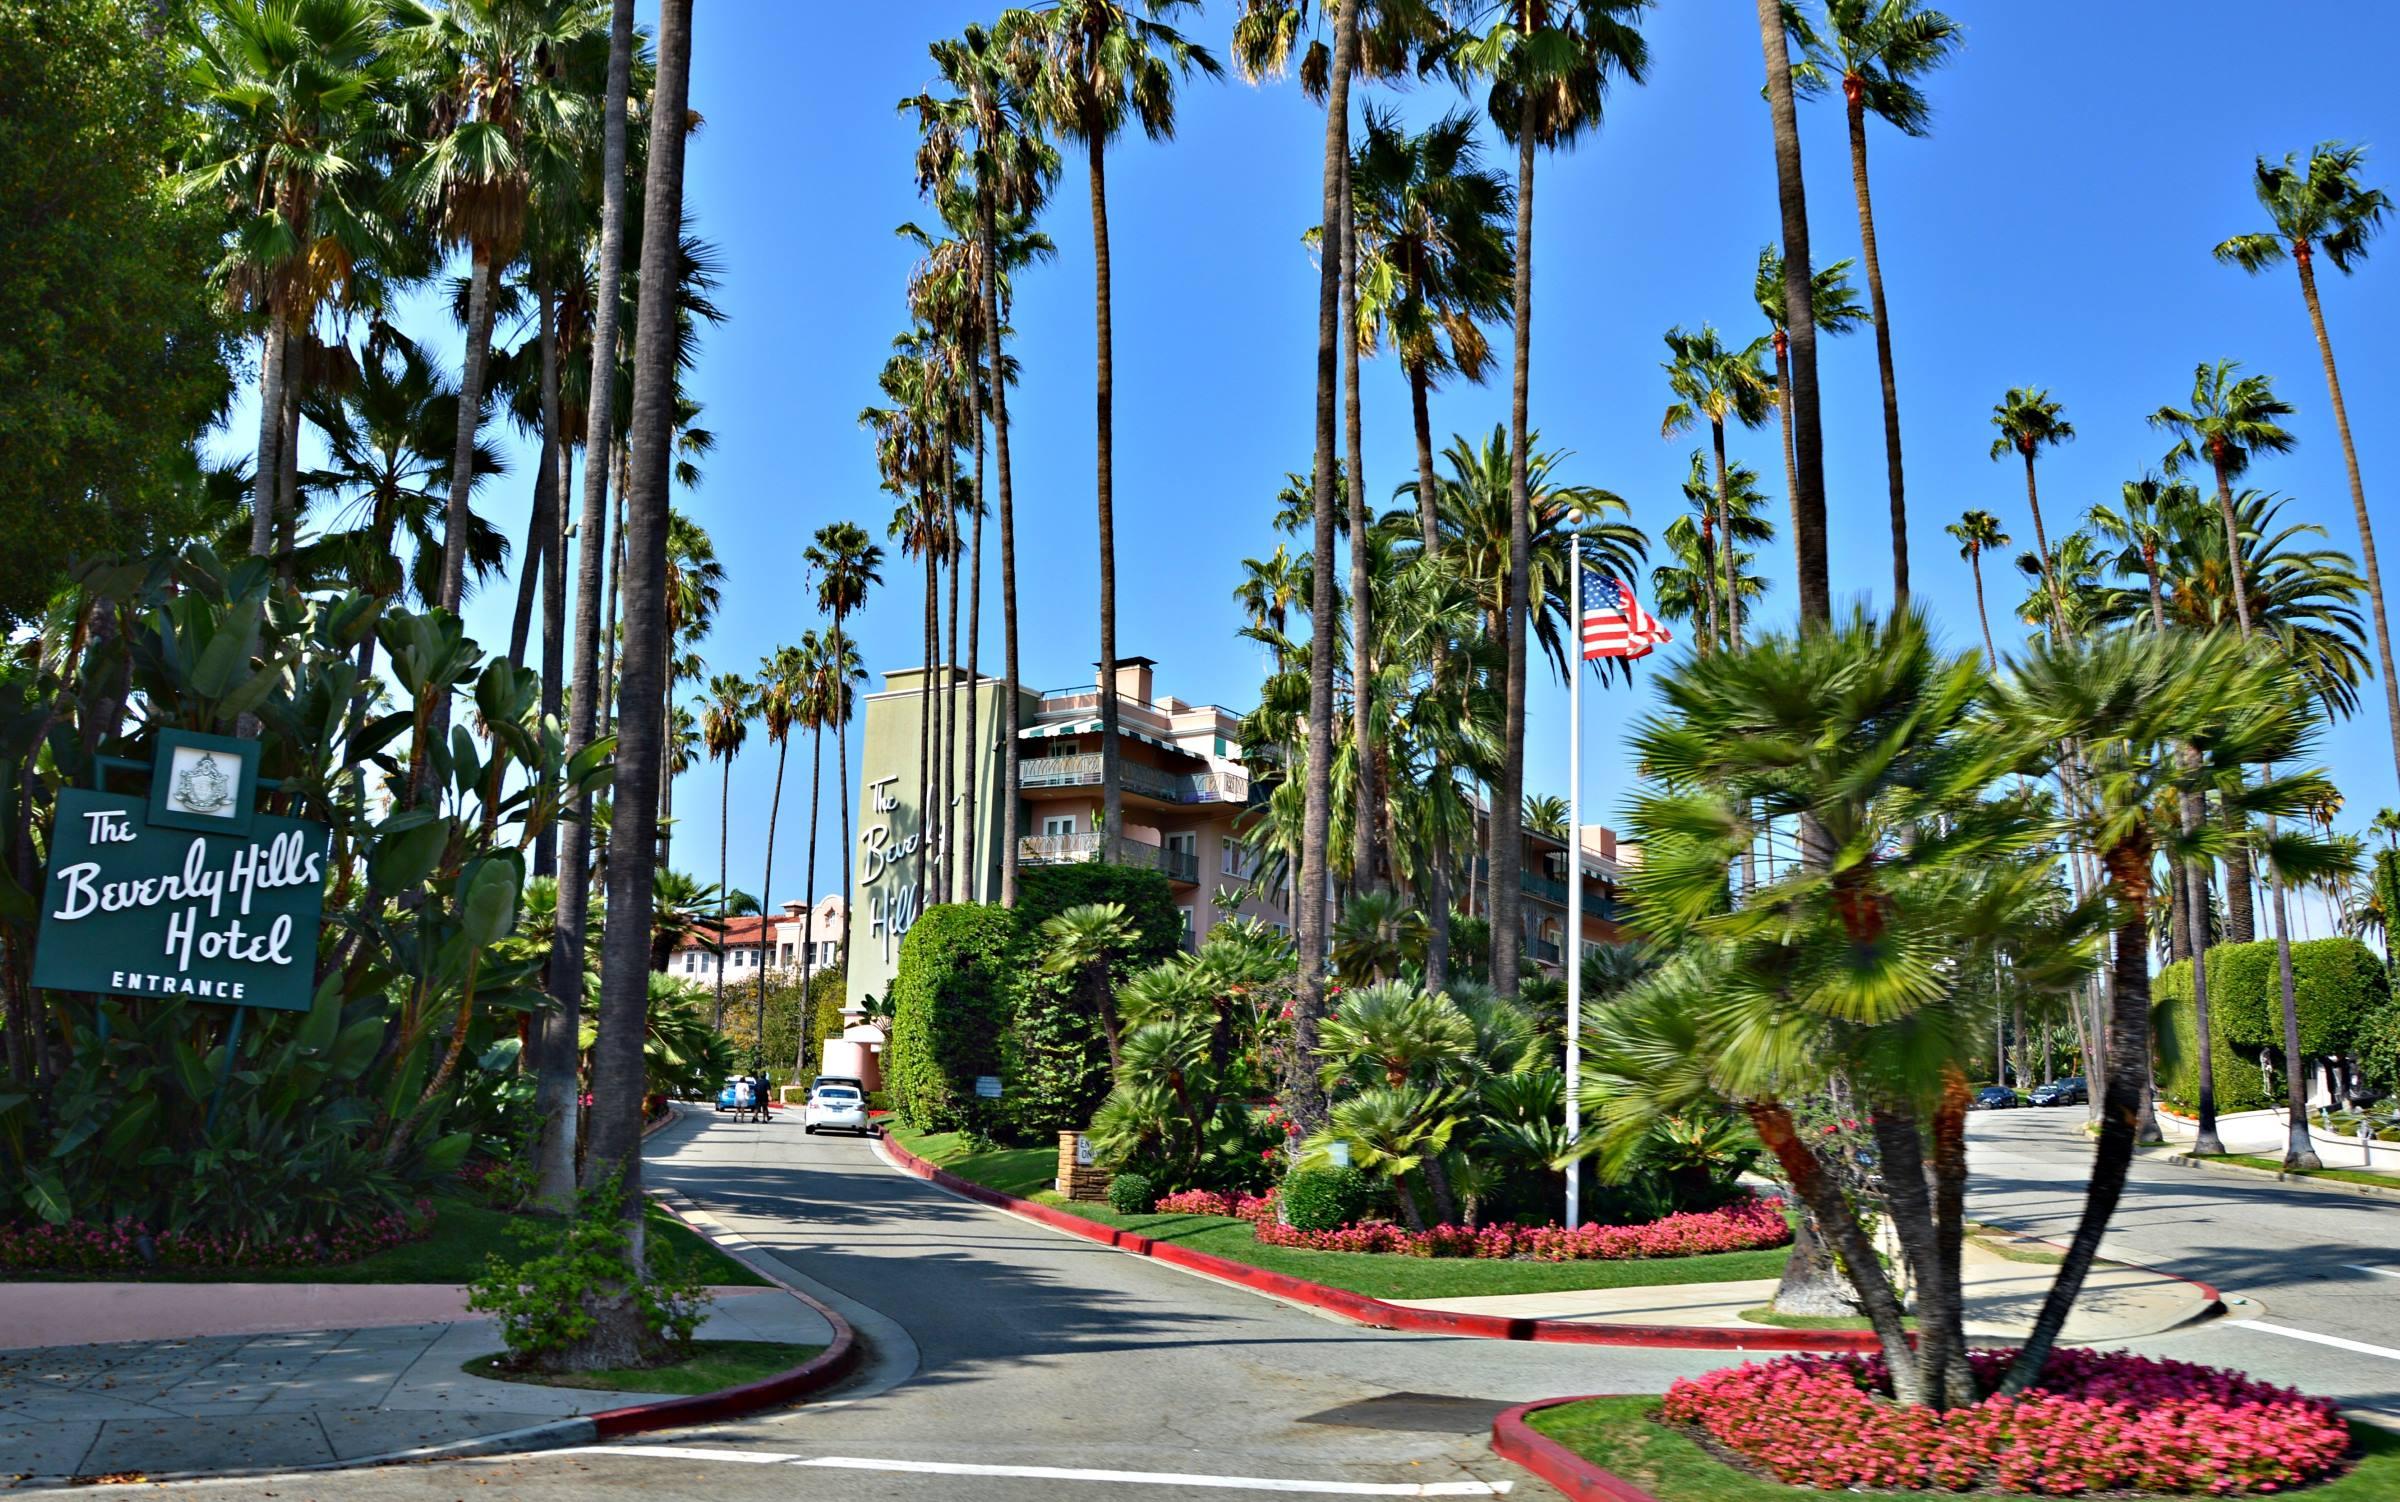 los angeles california beverley hills hotel palm trees